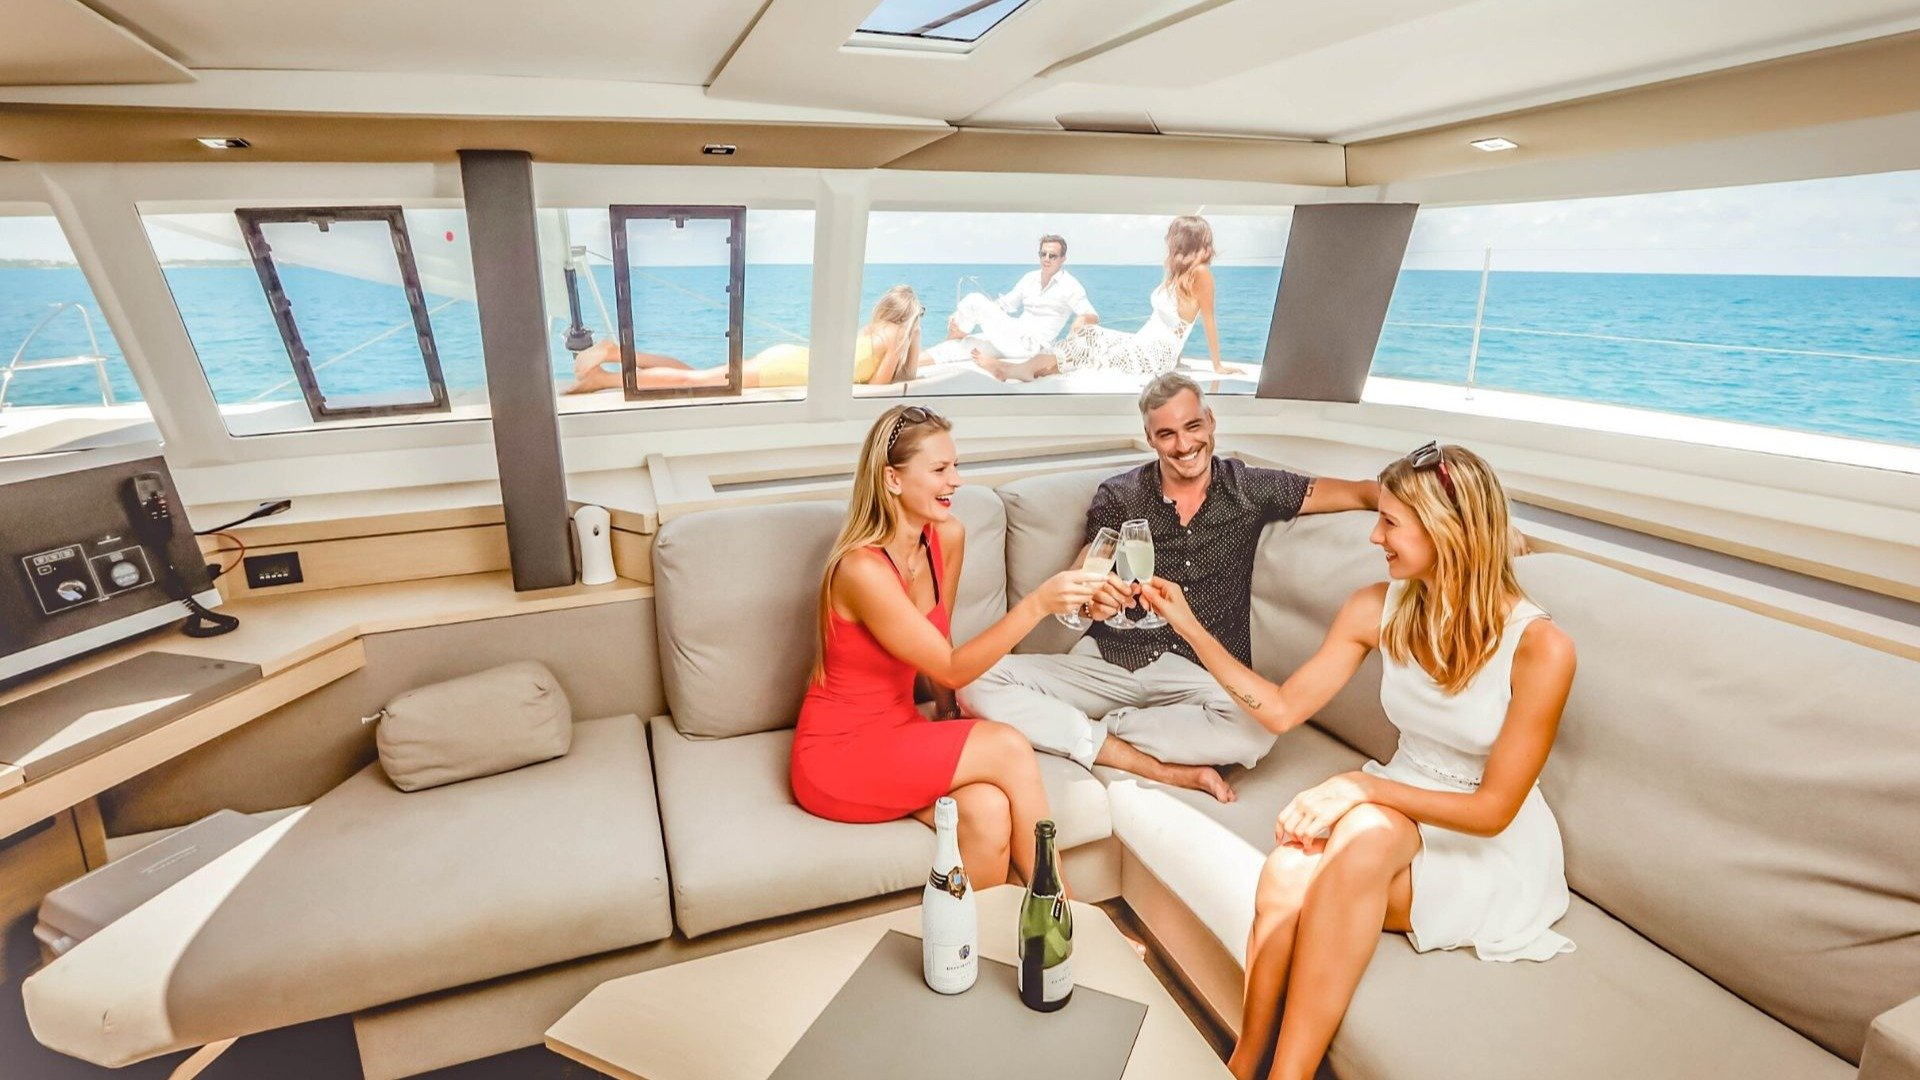 1 - LowRes - Private Isla Mujeres tour in catamaran - Victoria - Cancun Sailing